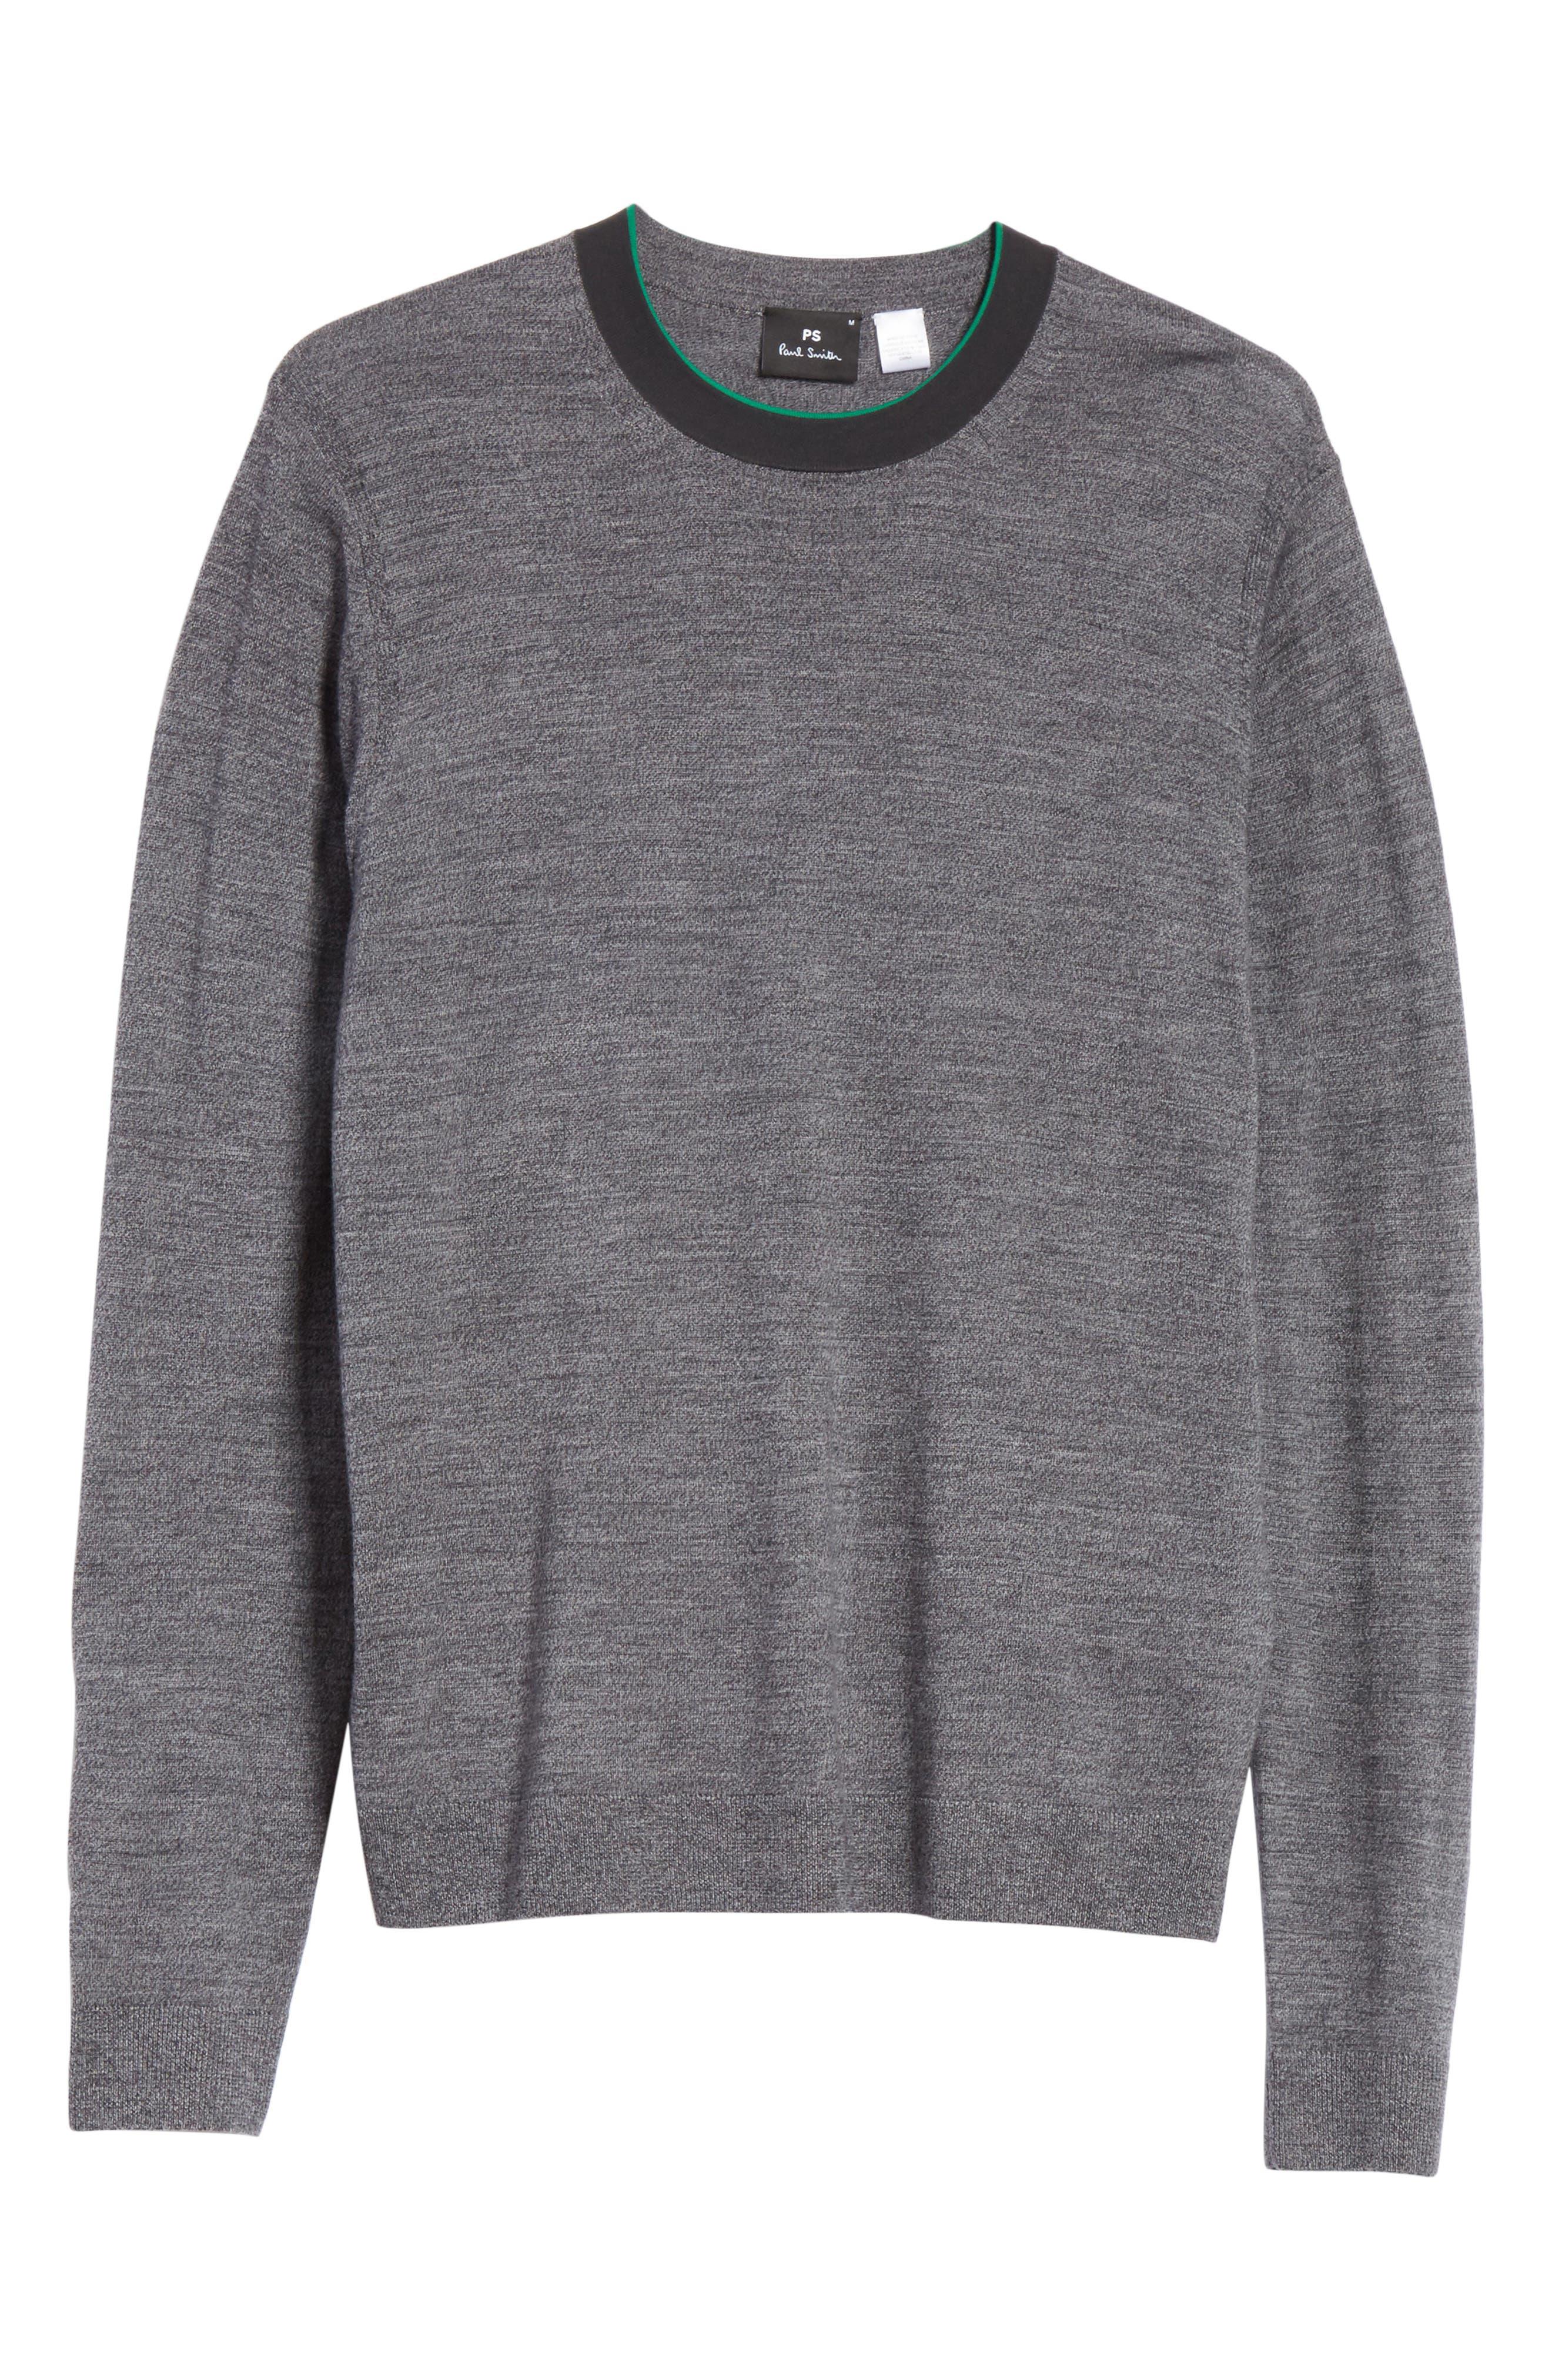 Crewneck Merino Wool Blend Sweater,                             Alternate thumbnail 6, color,                             021